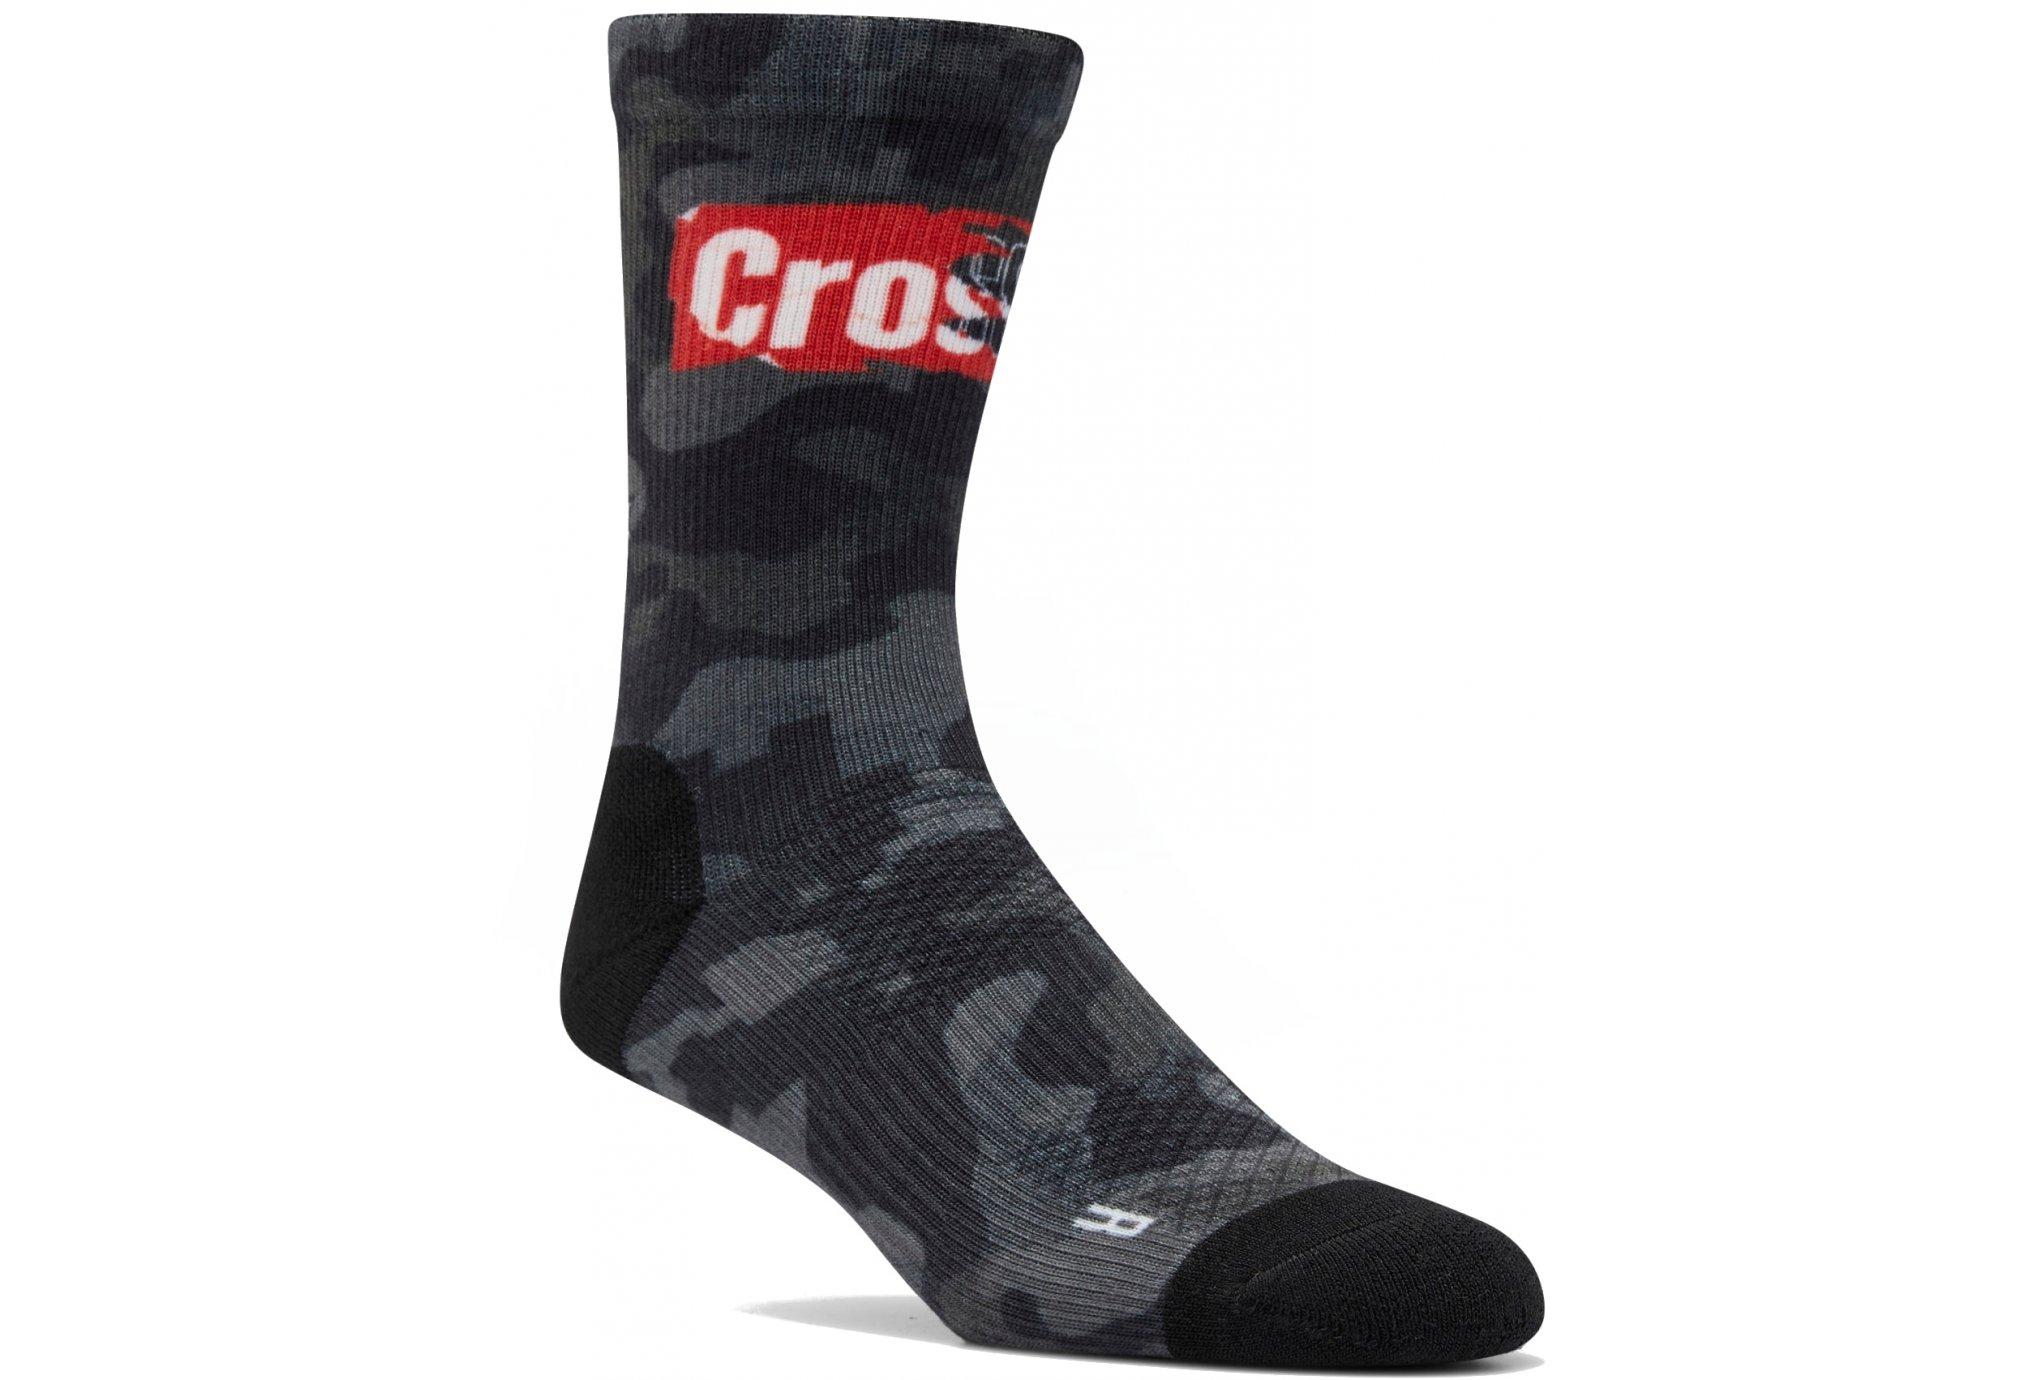 Reebok Crossfit Crew M Chaussettes